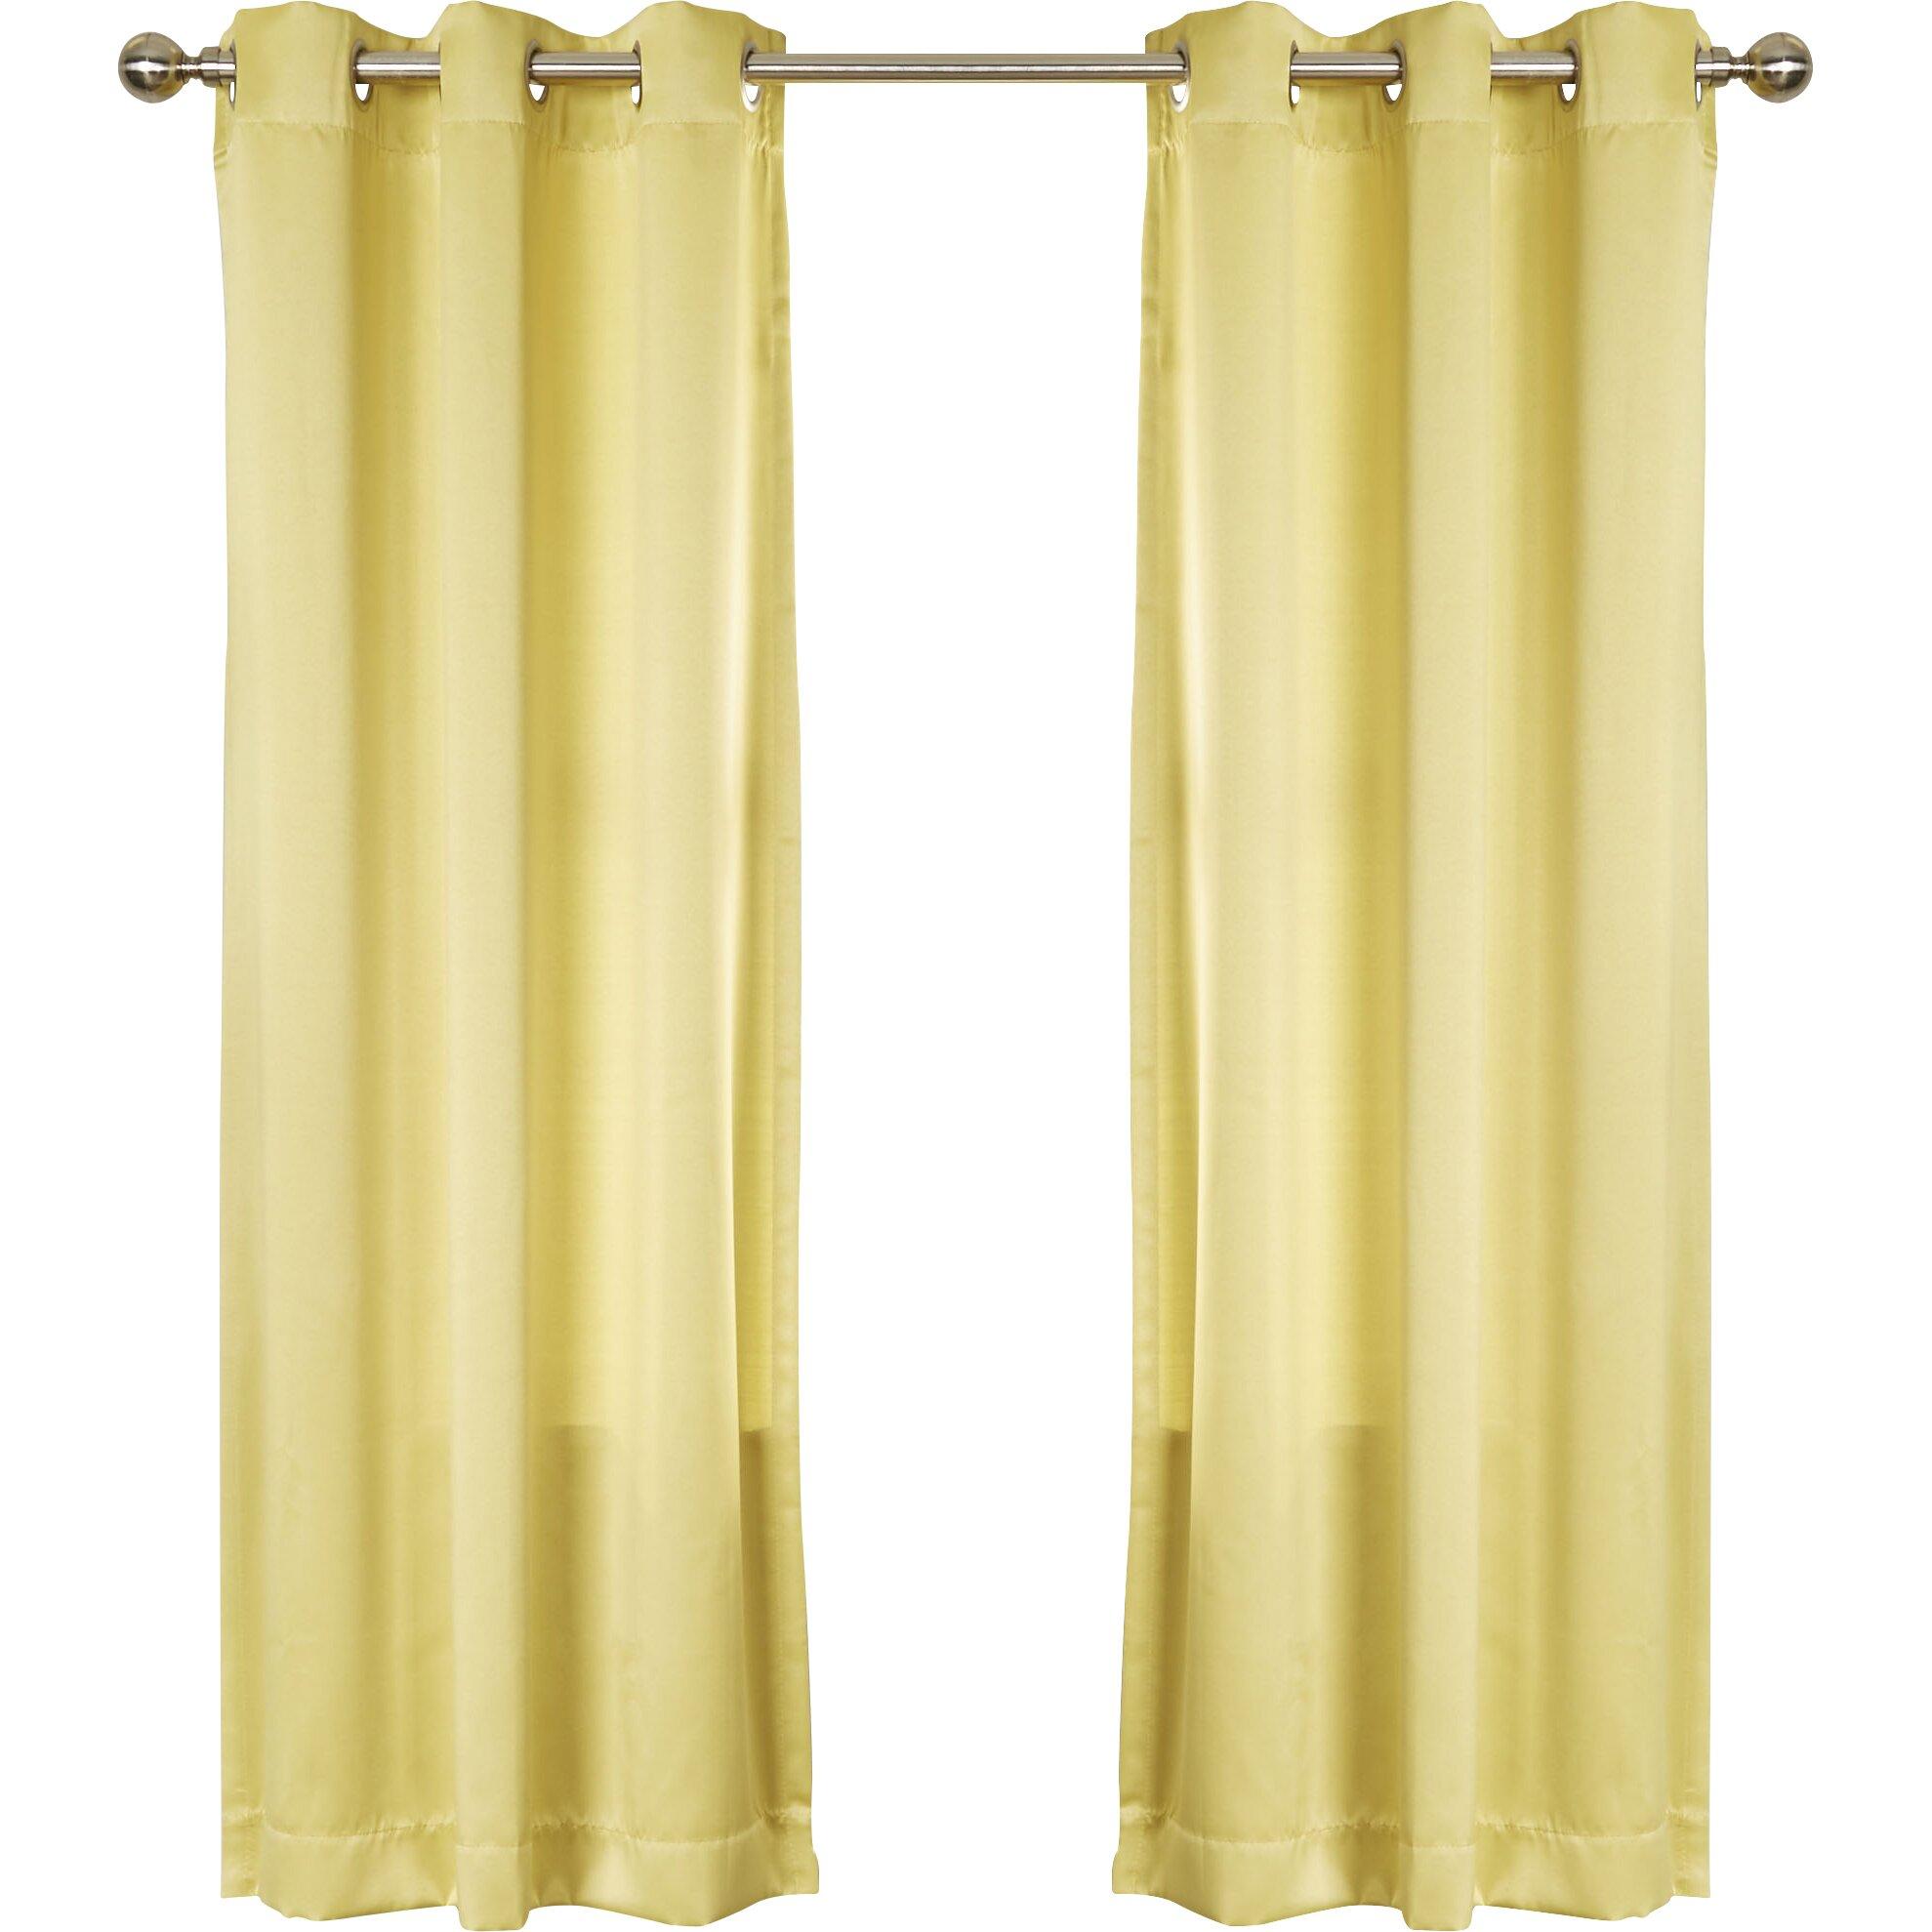 Wayfair Basics Wayfair Basics Grommet Single Curtain Panel